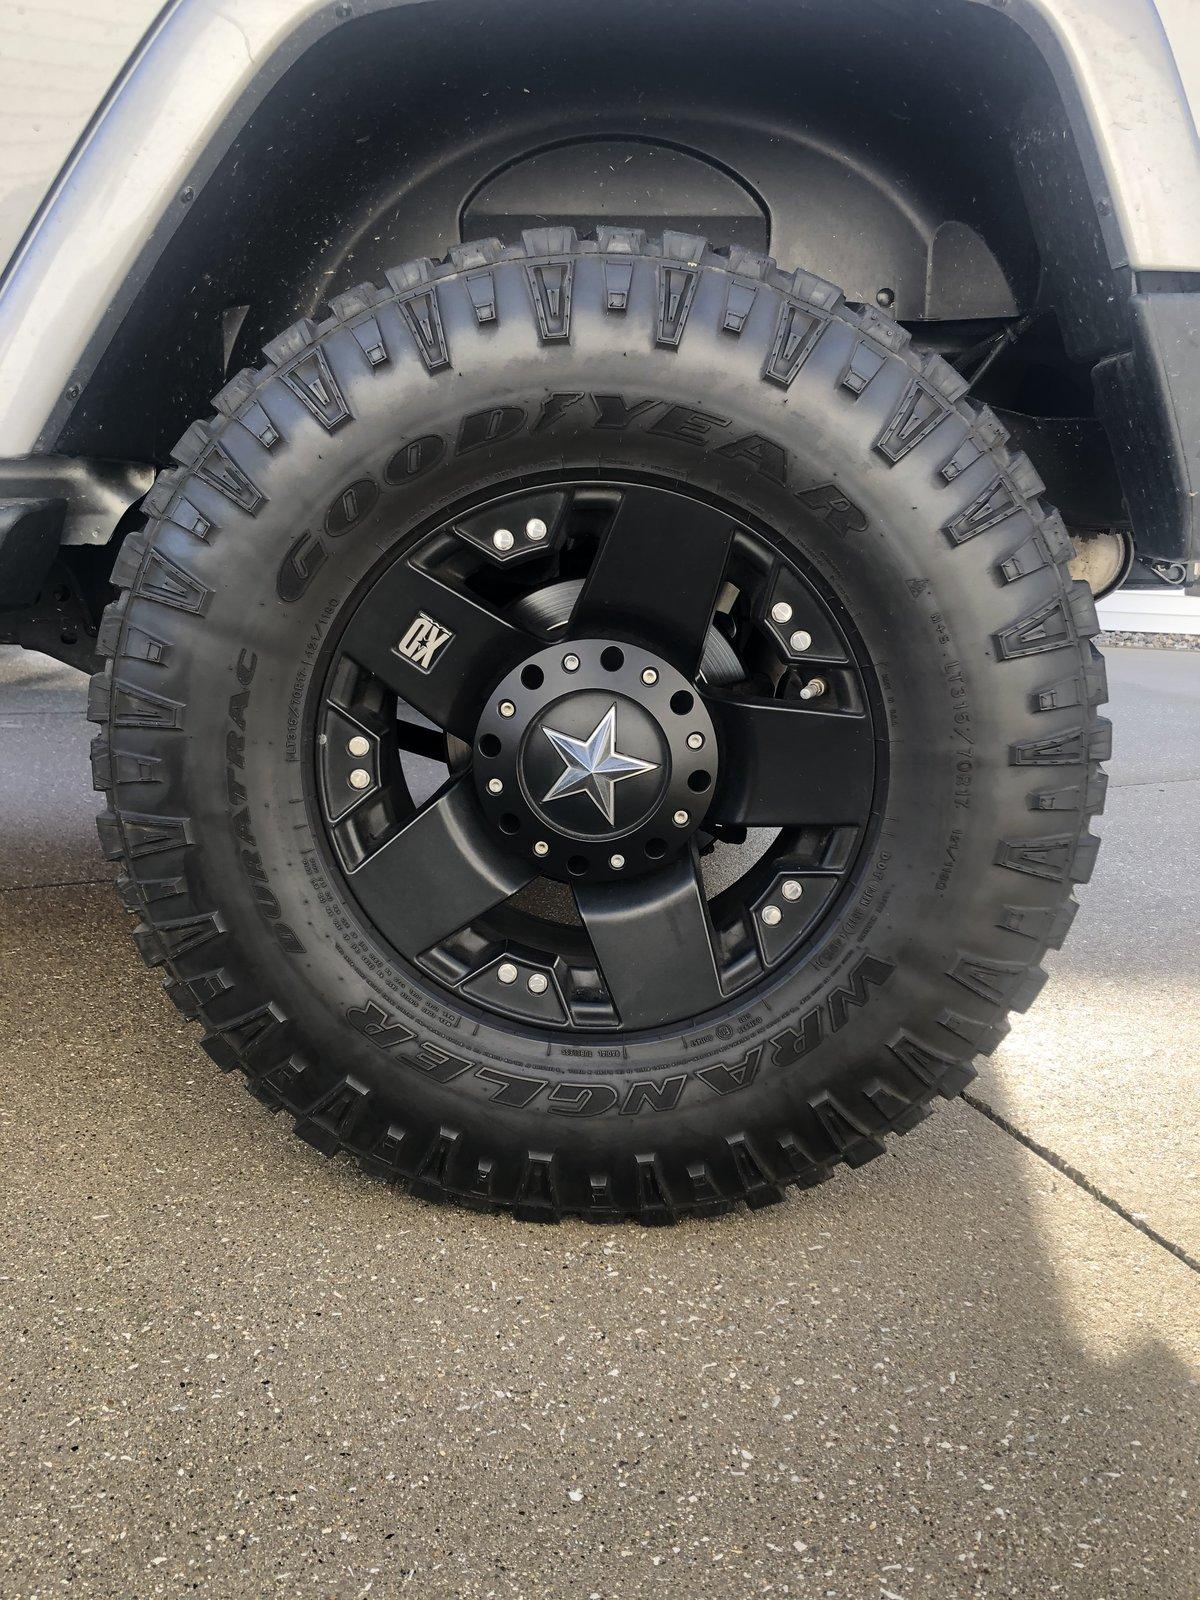 Xd Jeep Wheels : wheels, Indiana, Wheels, Tires, 2018+, Wrangler, Forums, Rubicon,, Sahara,, Sport,, Unlimited, JLwranglerforums.com